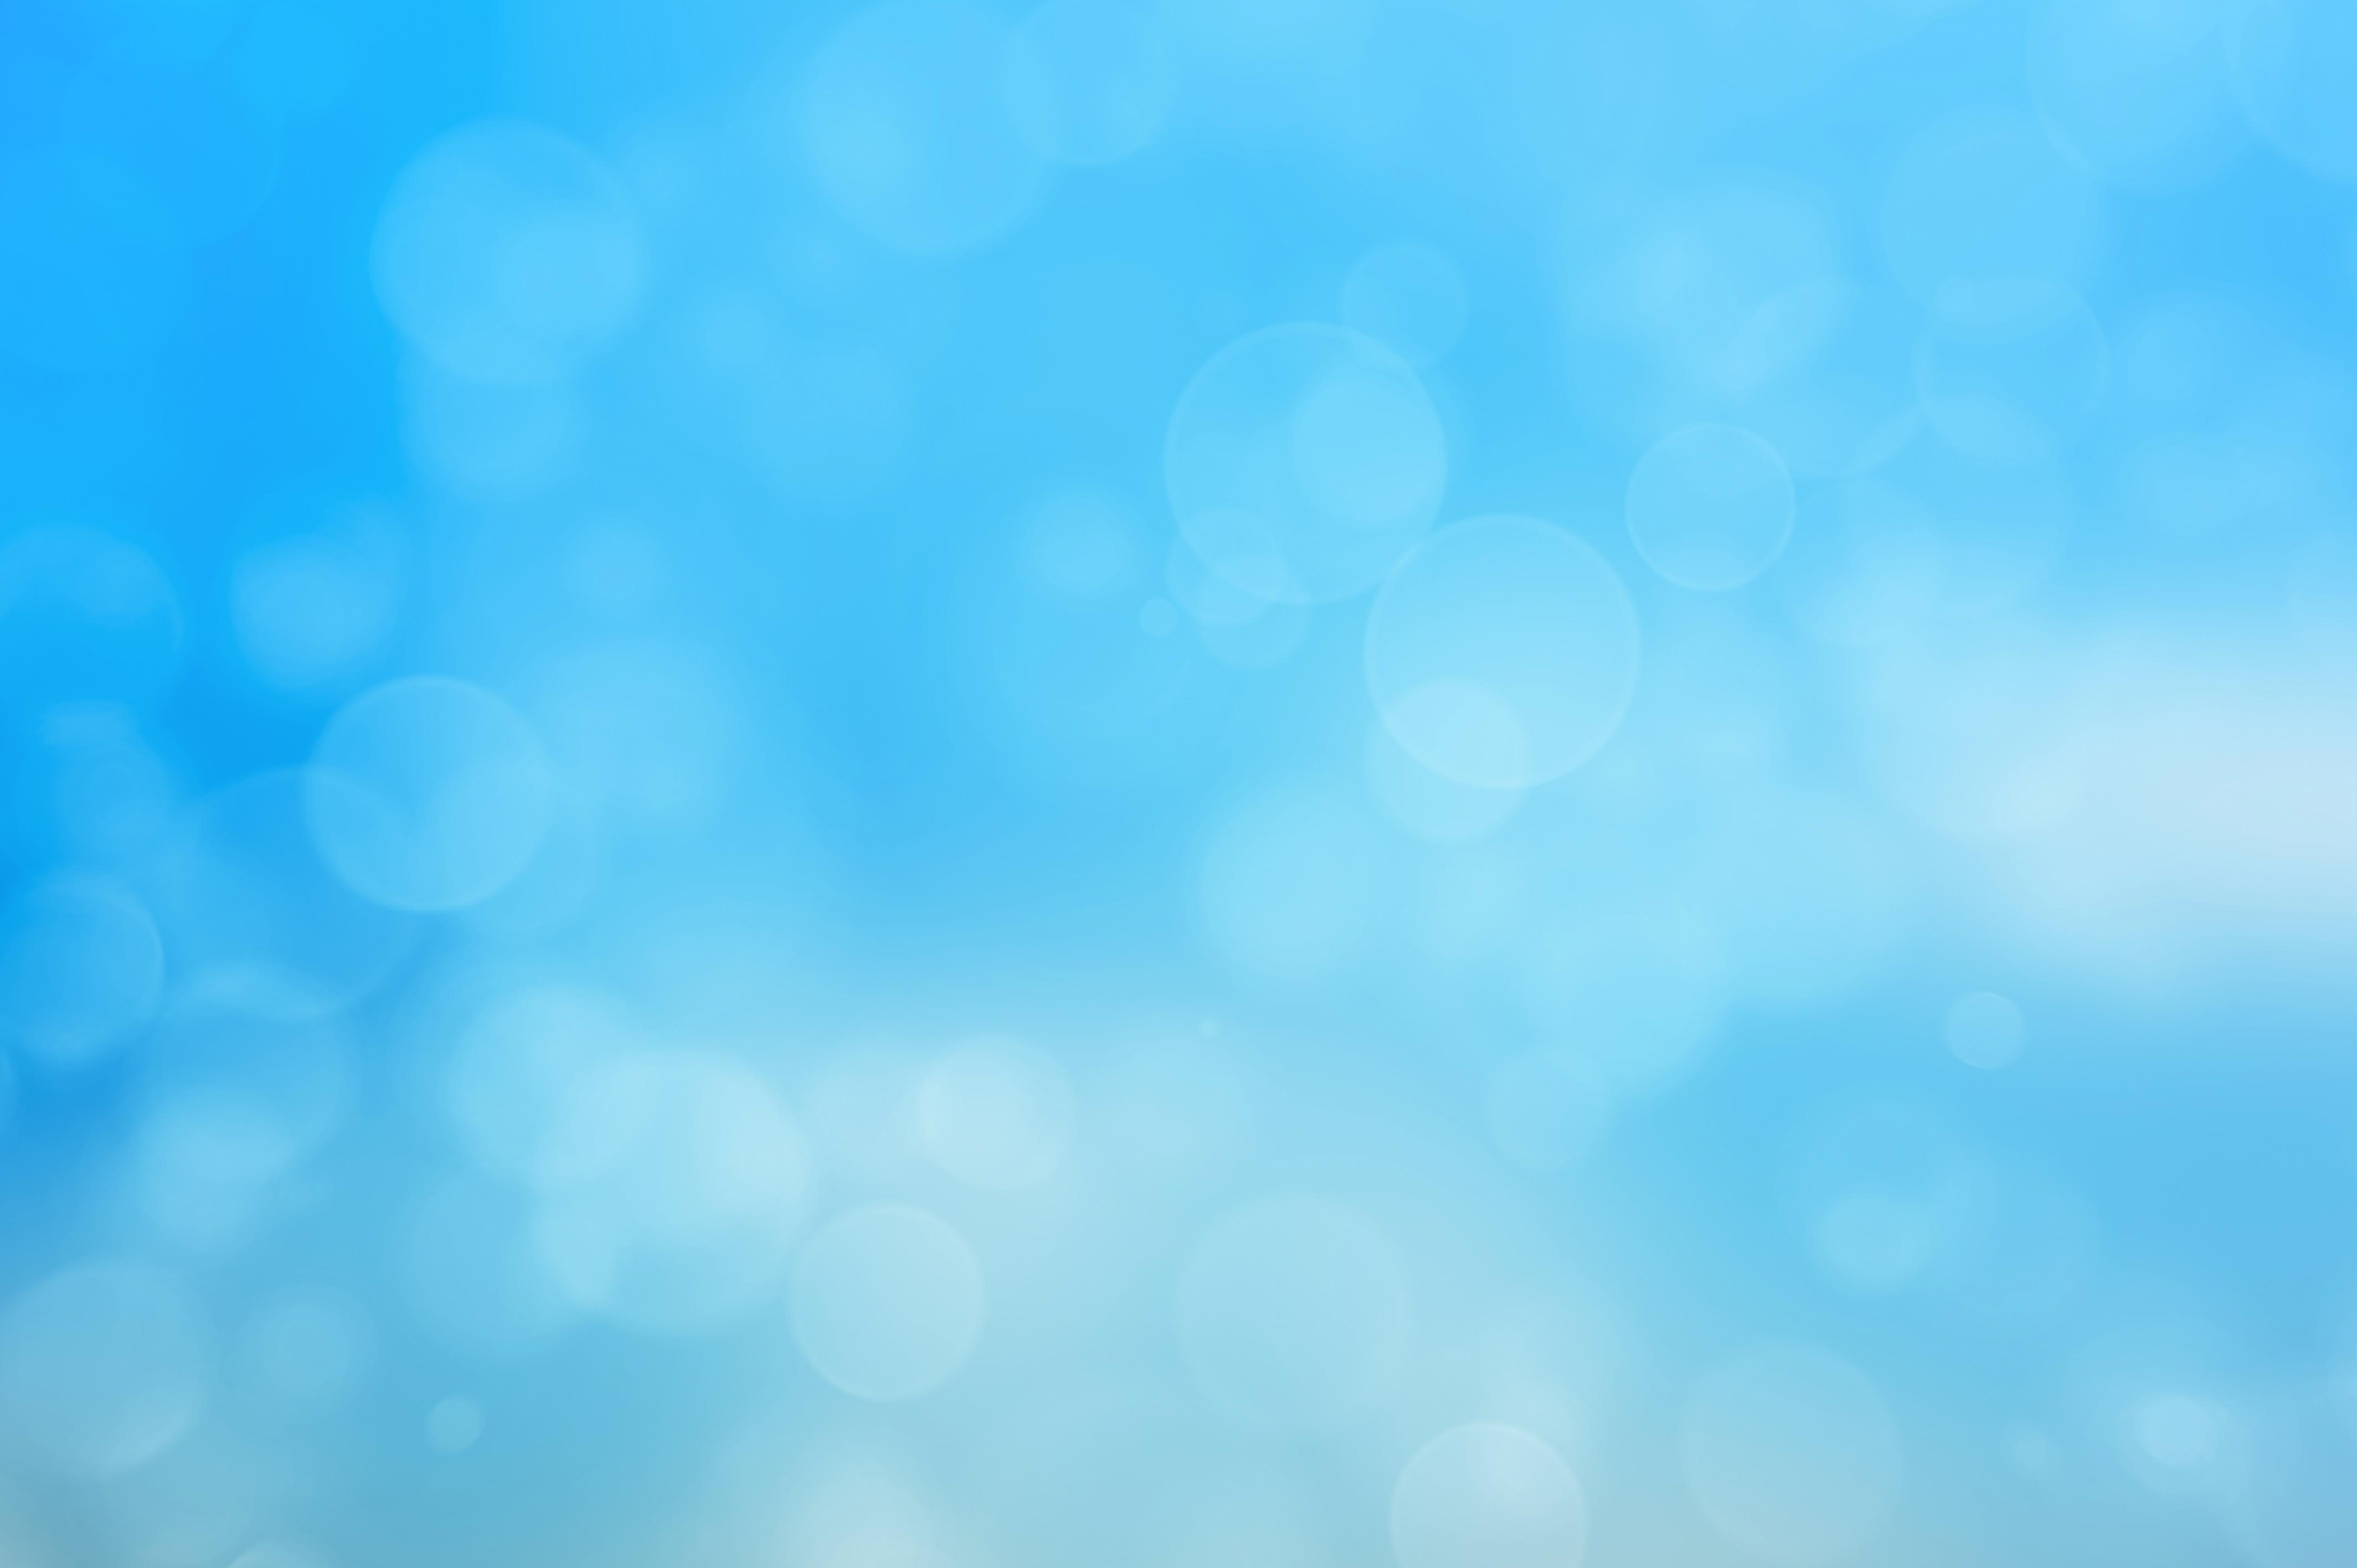 Sky Blue Backgrounds - WallpaperSafari